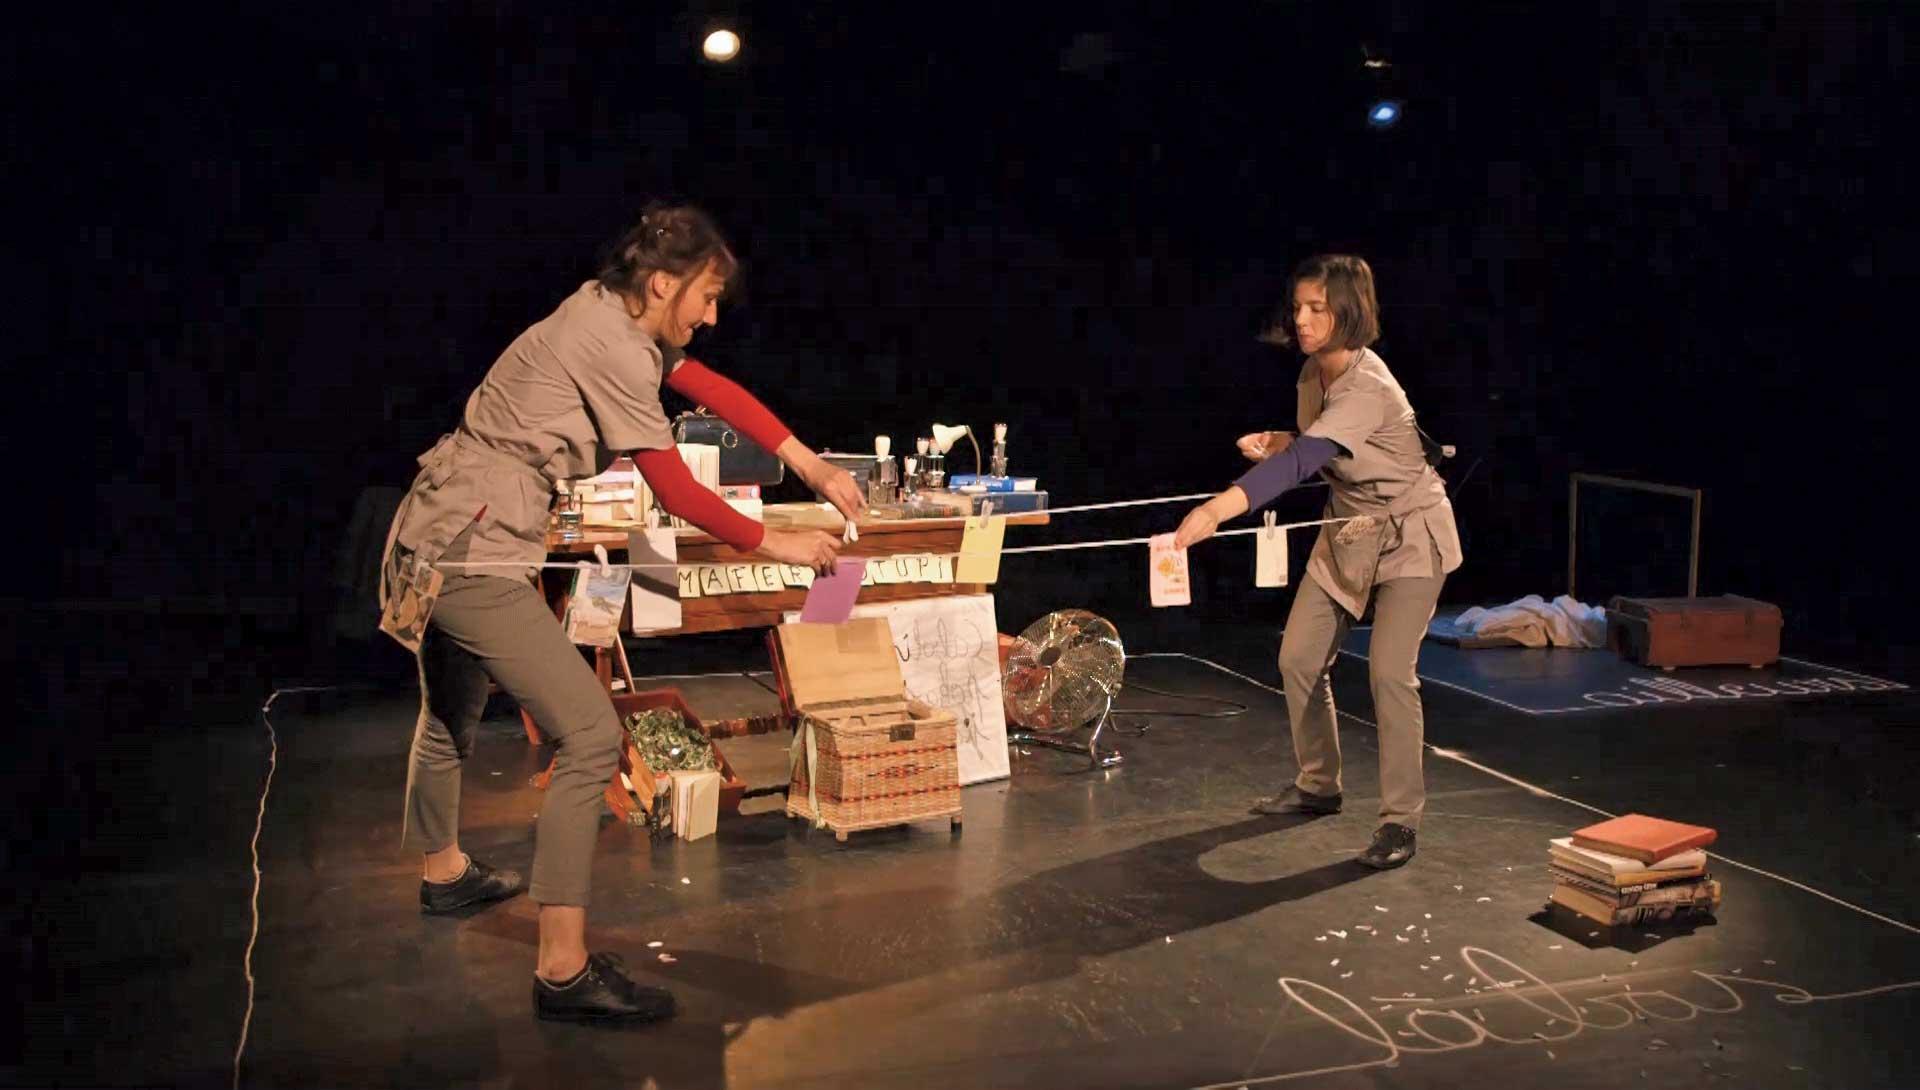 Theatre-de-Givors_Mafericotupi_(c)Audrey-Chanonat